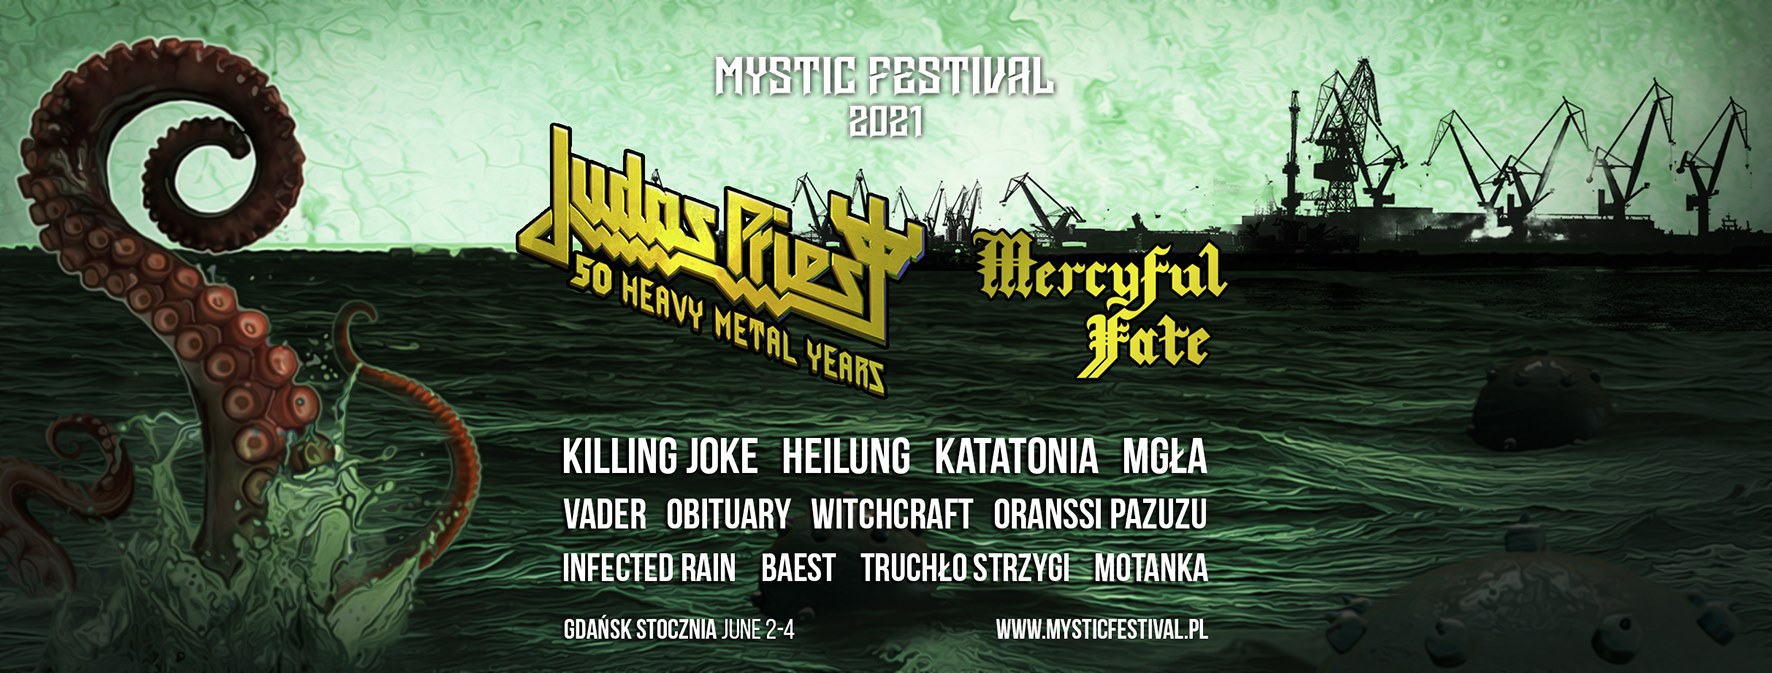 mysticfest_2021_01.jpg